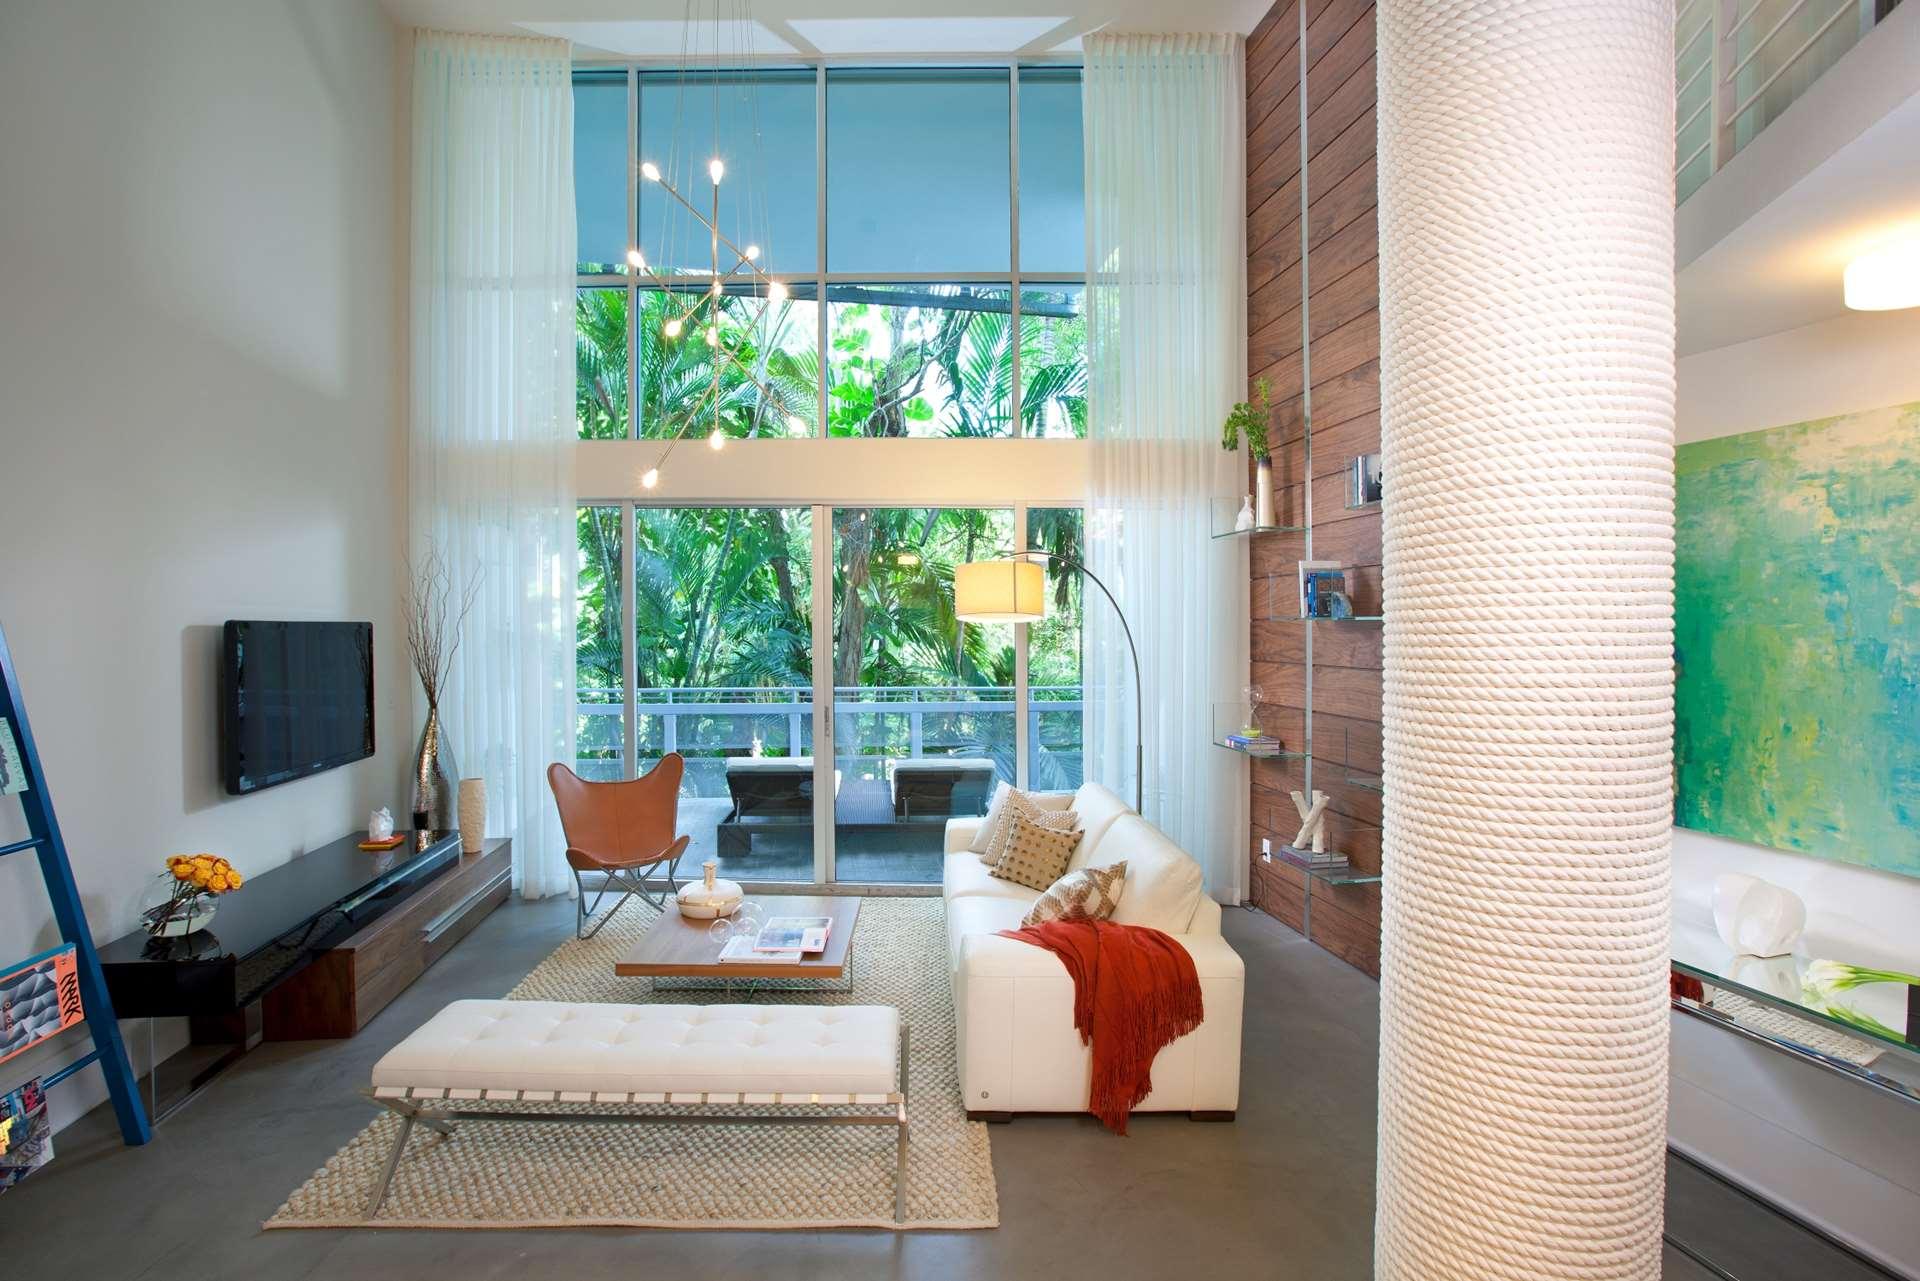 South beach chic dkor interiors for Interior design blogs